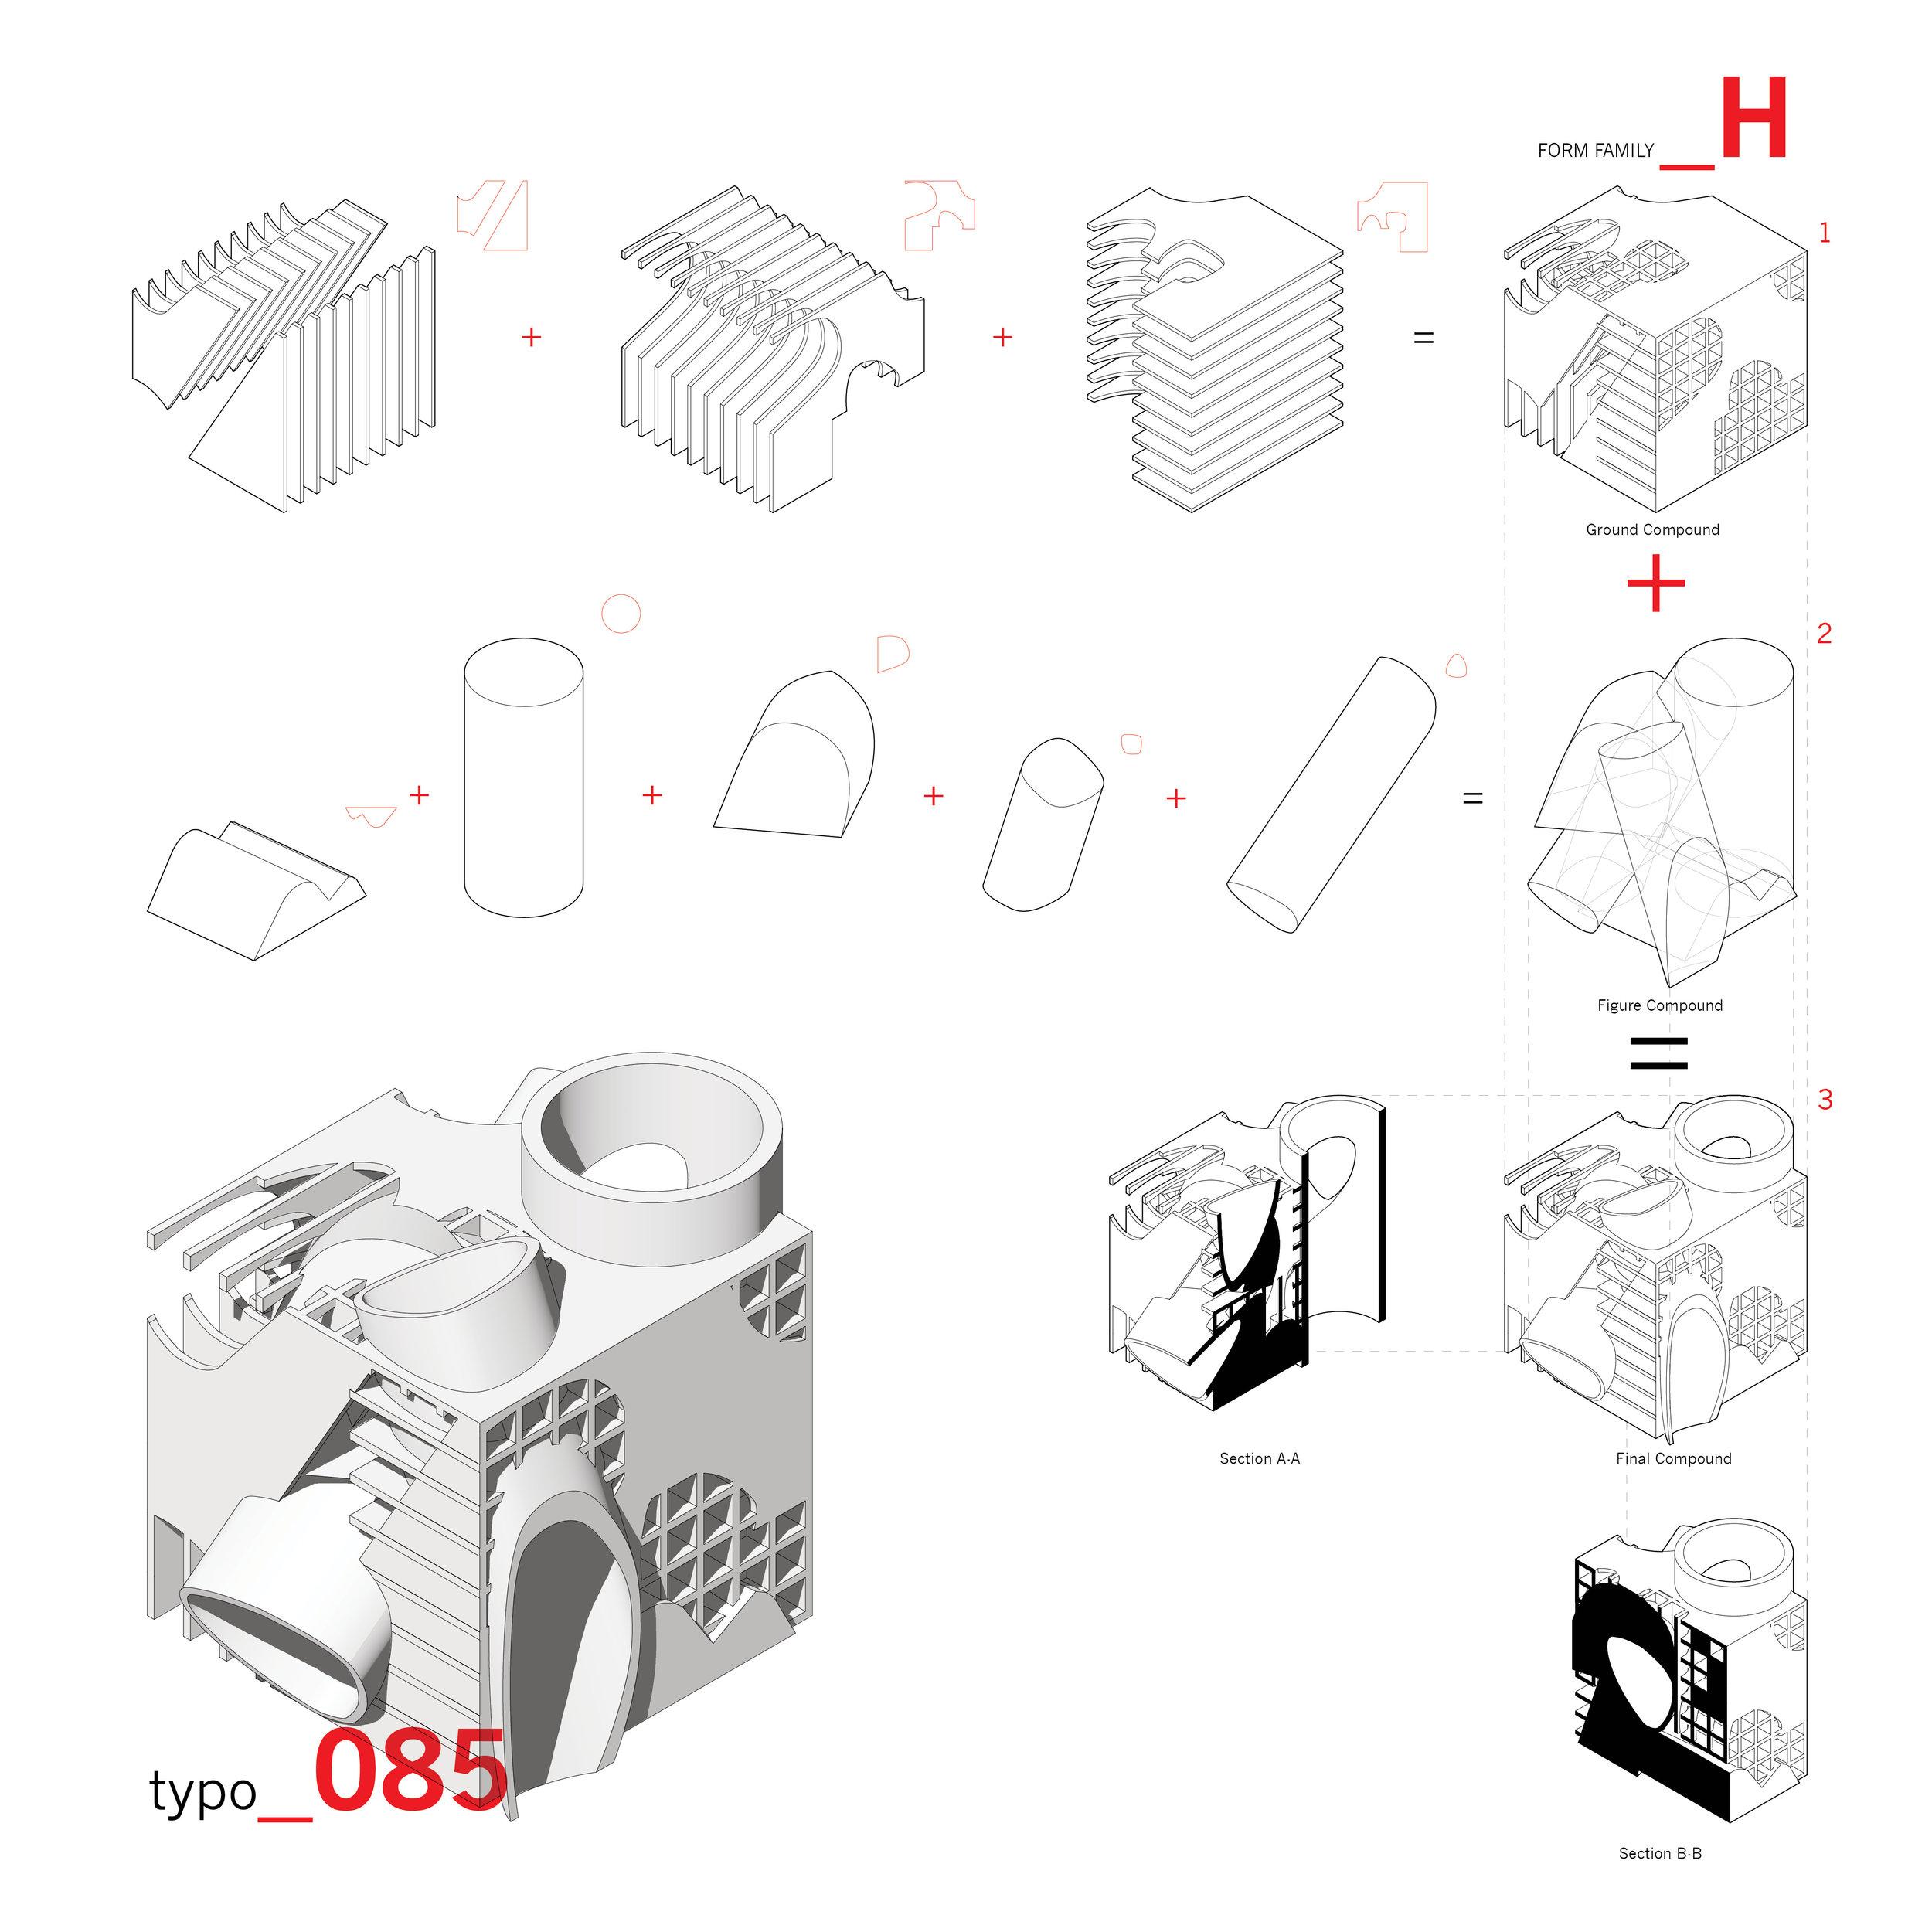 diagrams5.jpg